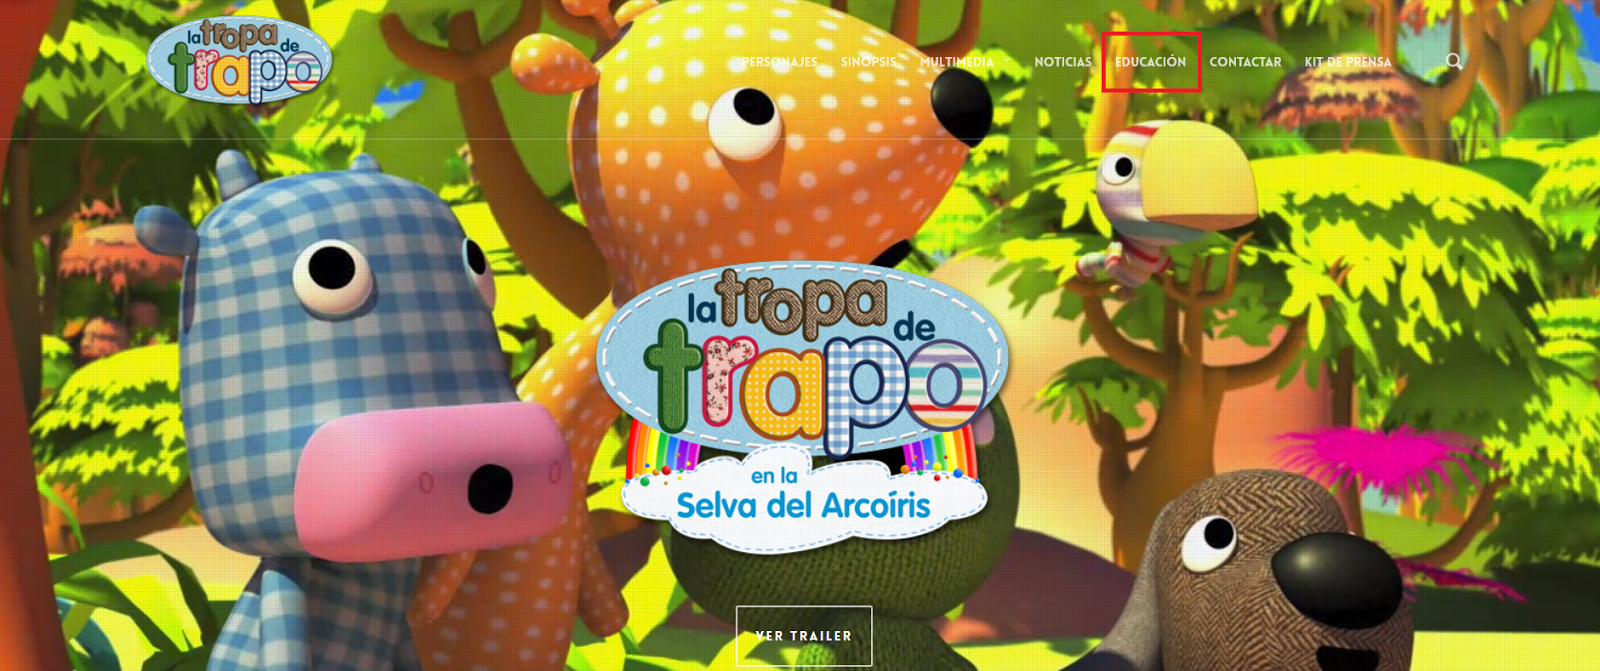 http://www.thehappets.com/en-la-selva-del-arcoiris/